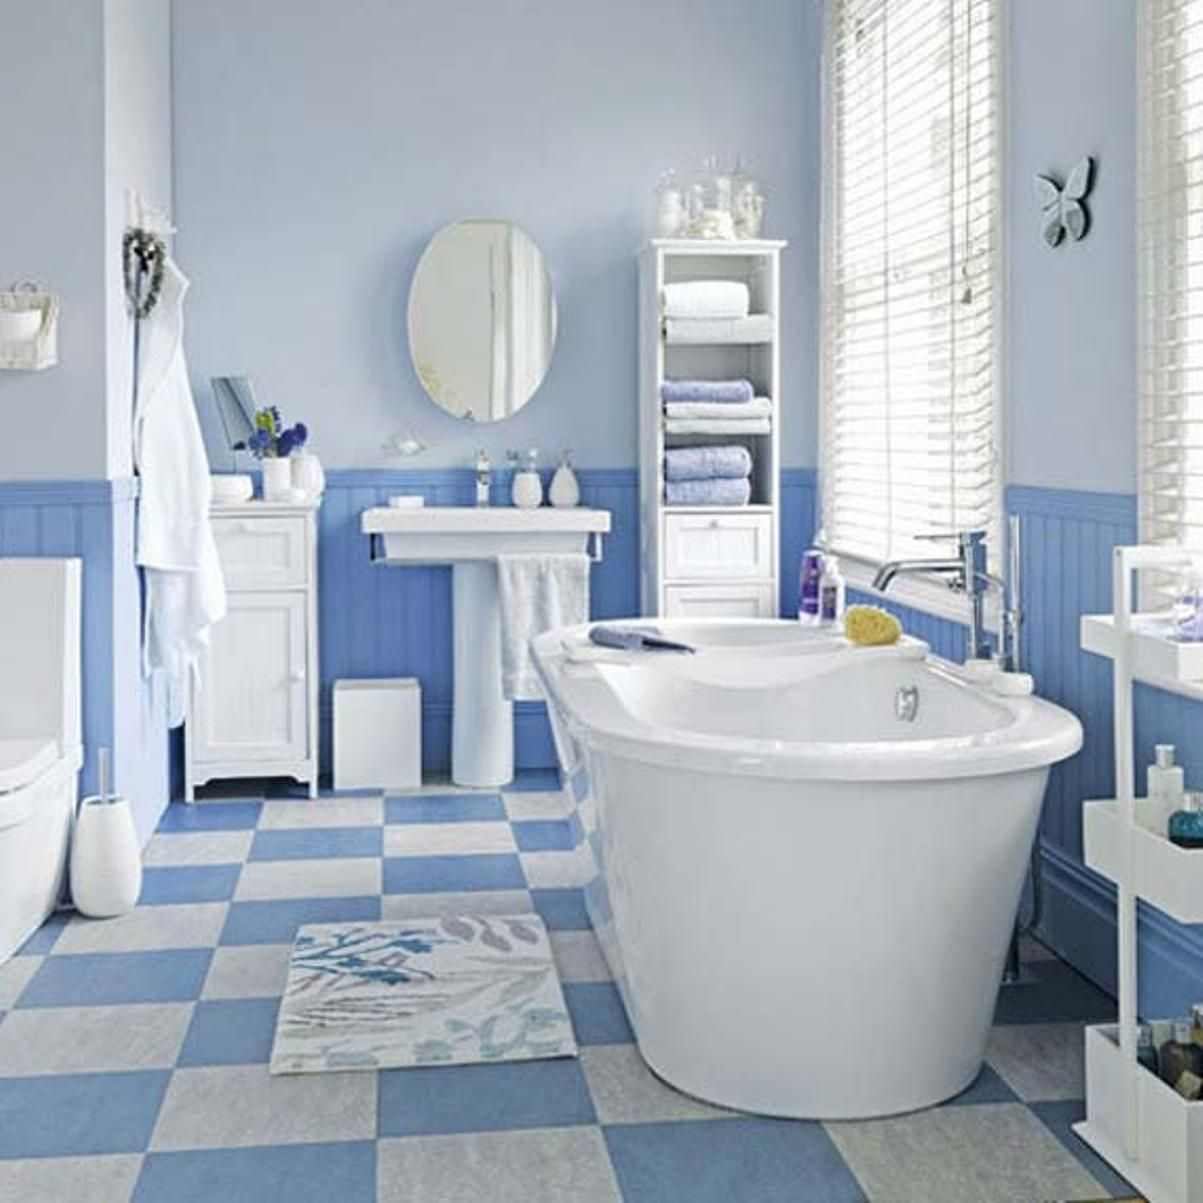 Bathroom Ceramic Bathroom Floor Tiles Coastal Blue Bathroom With Checkered Ceramic White Blue White Bathrooms Bathroom Tile Designs Family Bathroom Design